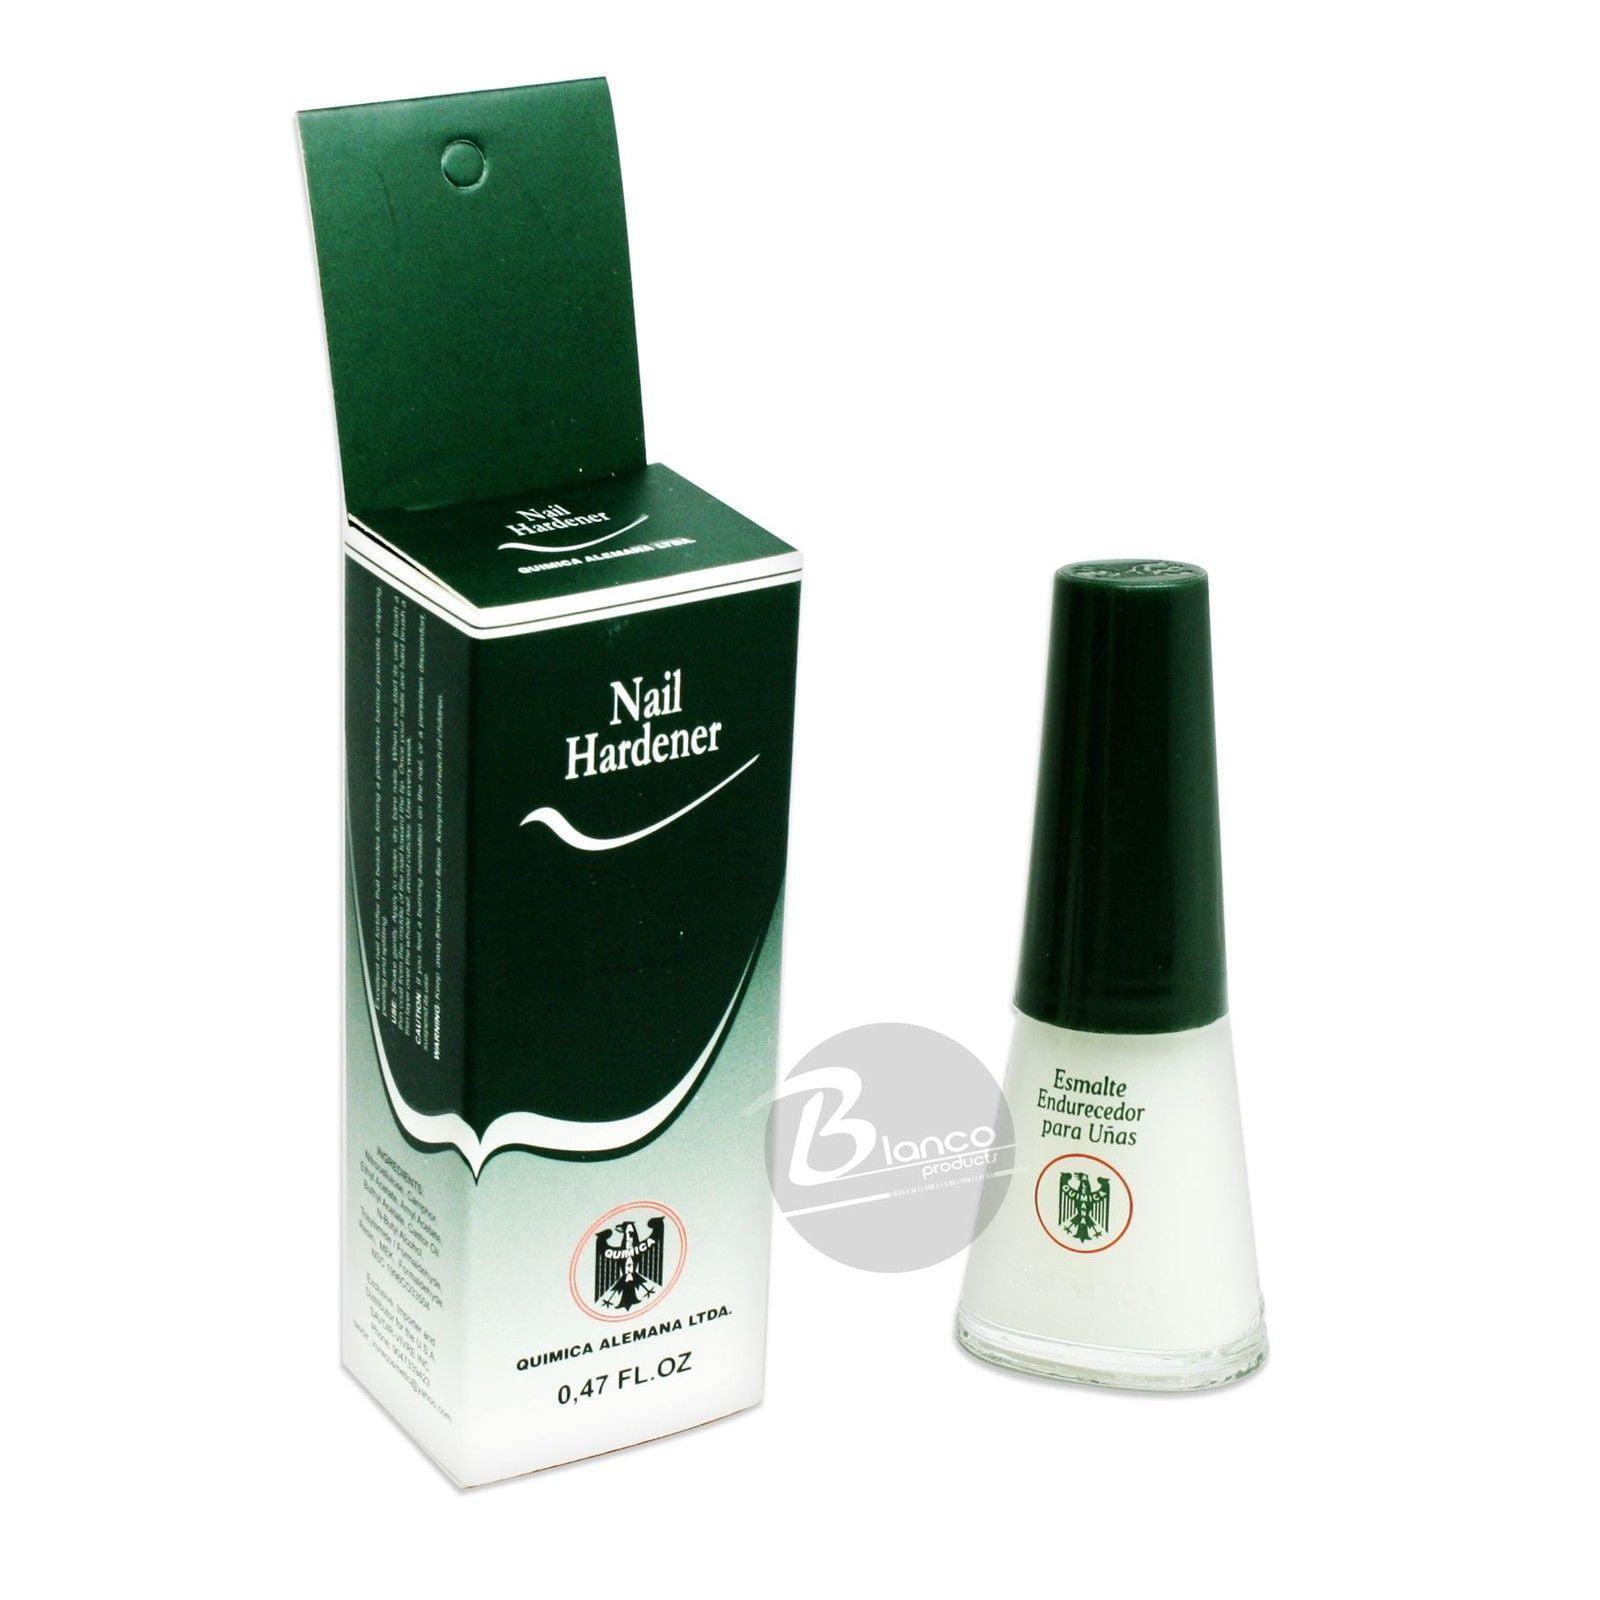 Quimica Alemana Nail Hardener Strengthener Polish Treatment 0.47 oz